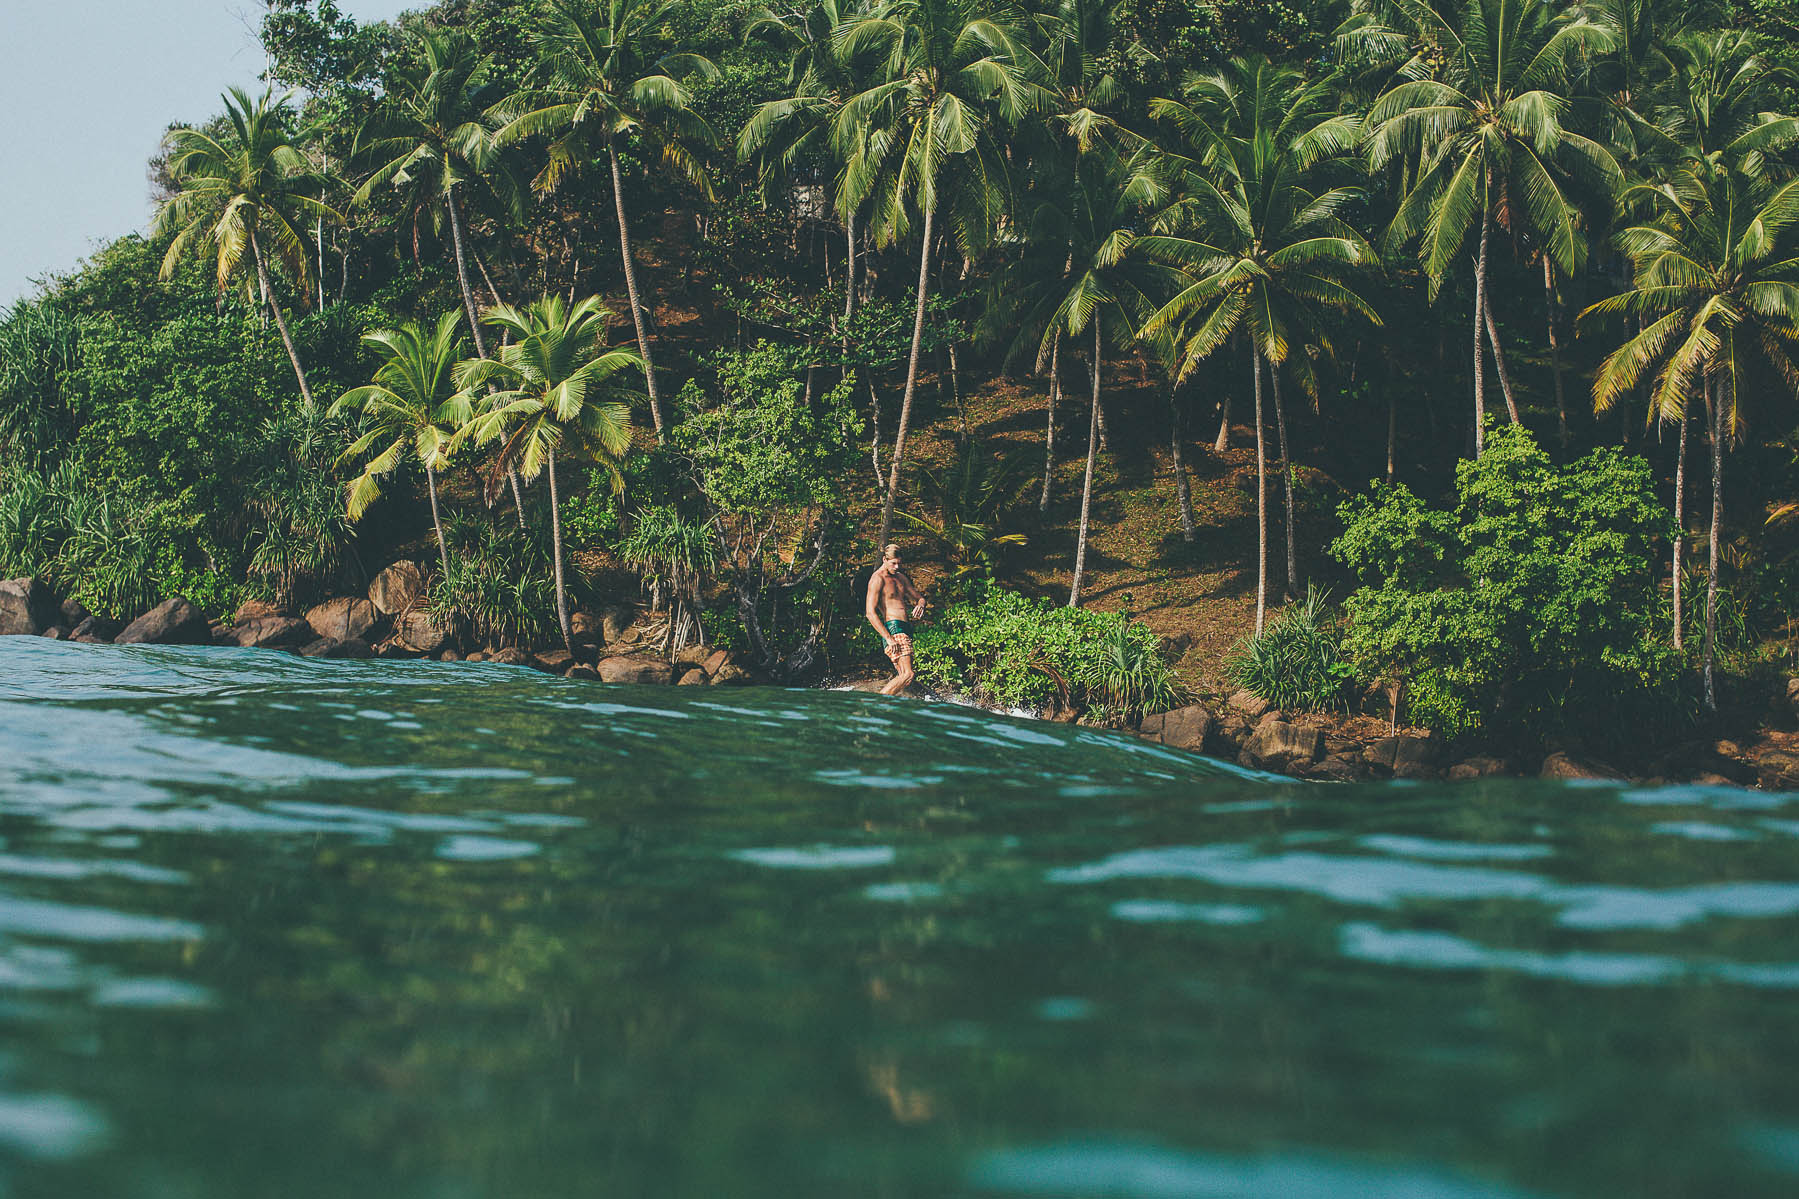 Surf-Camp-Yoga-Retreat-Sri Lanka-Hikkaduwa-Midigama-Arugam Bay-Pottuvil-Mirissa-Ahangama-Madiha-Medawatta-Sunshinestories-surf-travel-blog-Sunshineprint-highresM06A1360.jpg